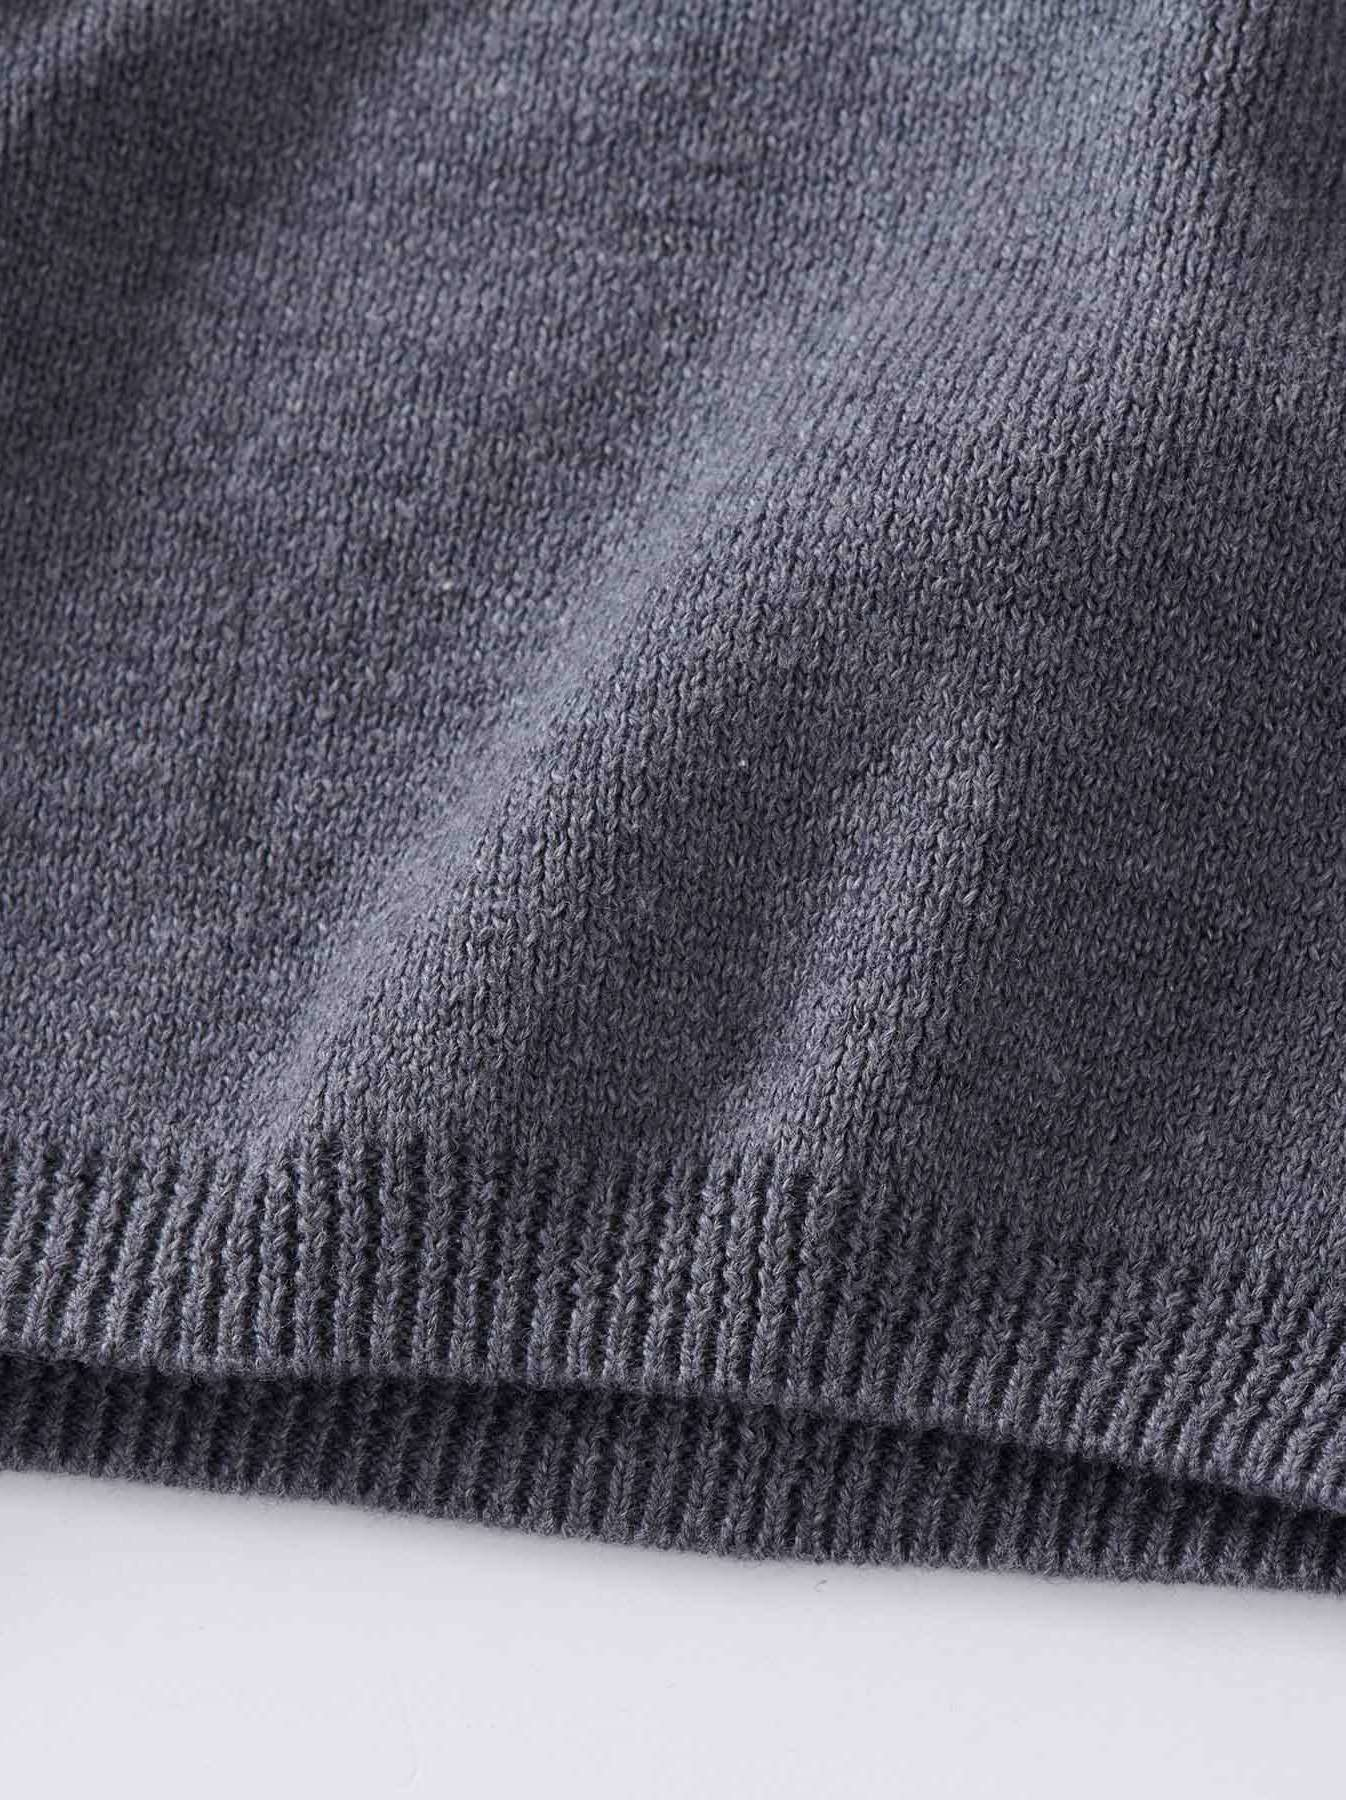 WH Supima Knit-sew Coat-12